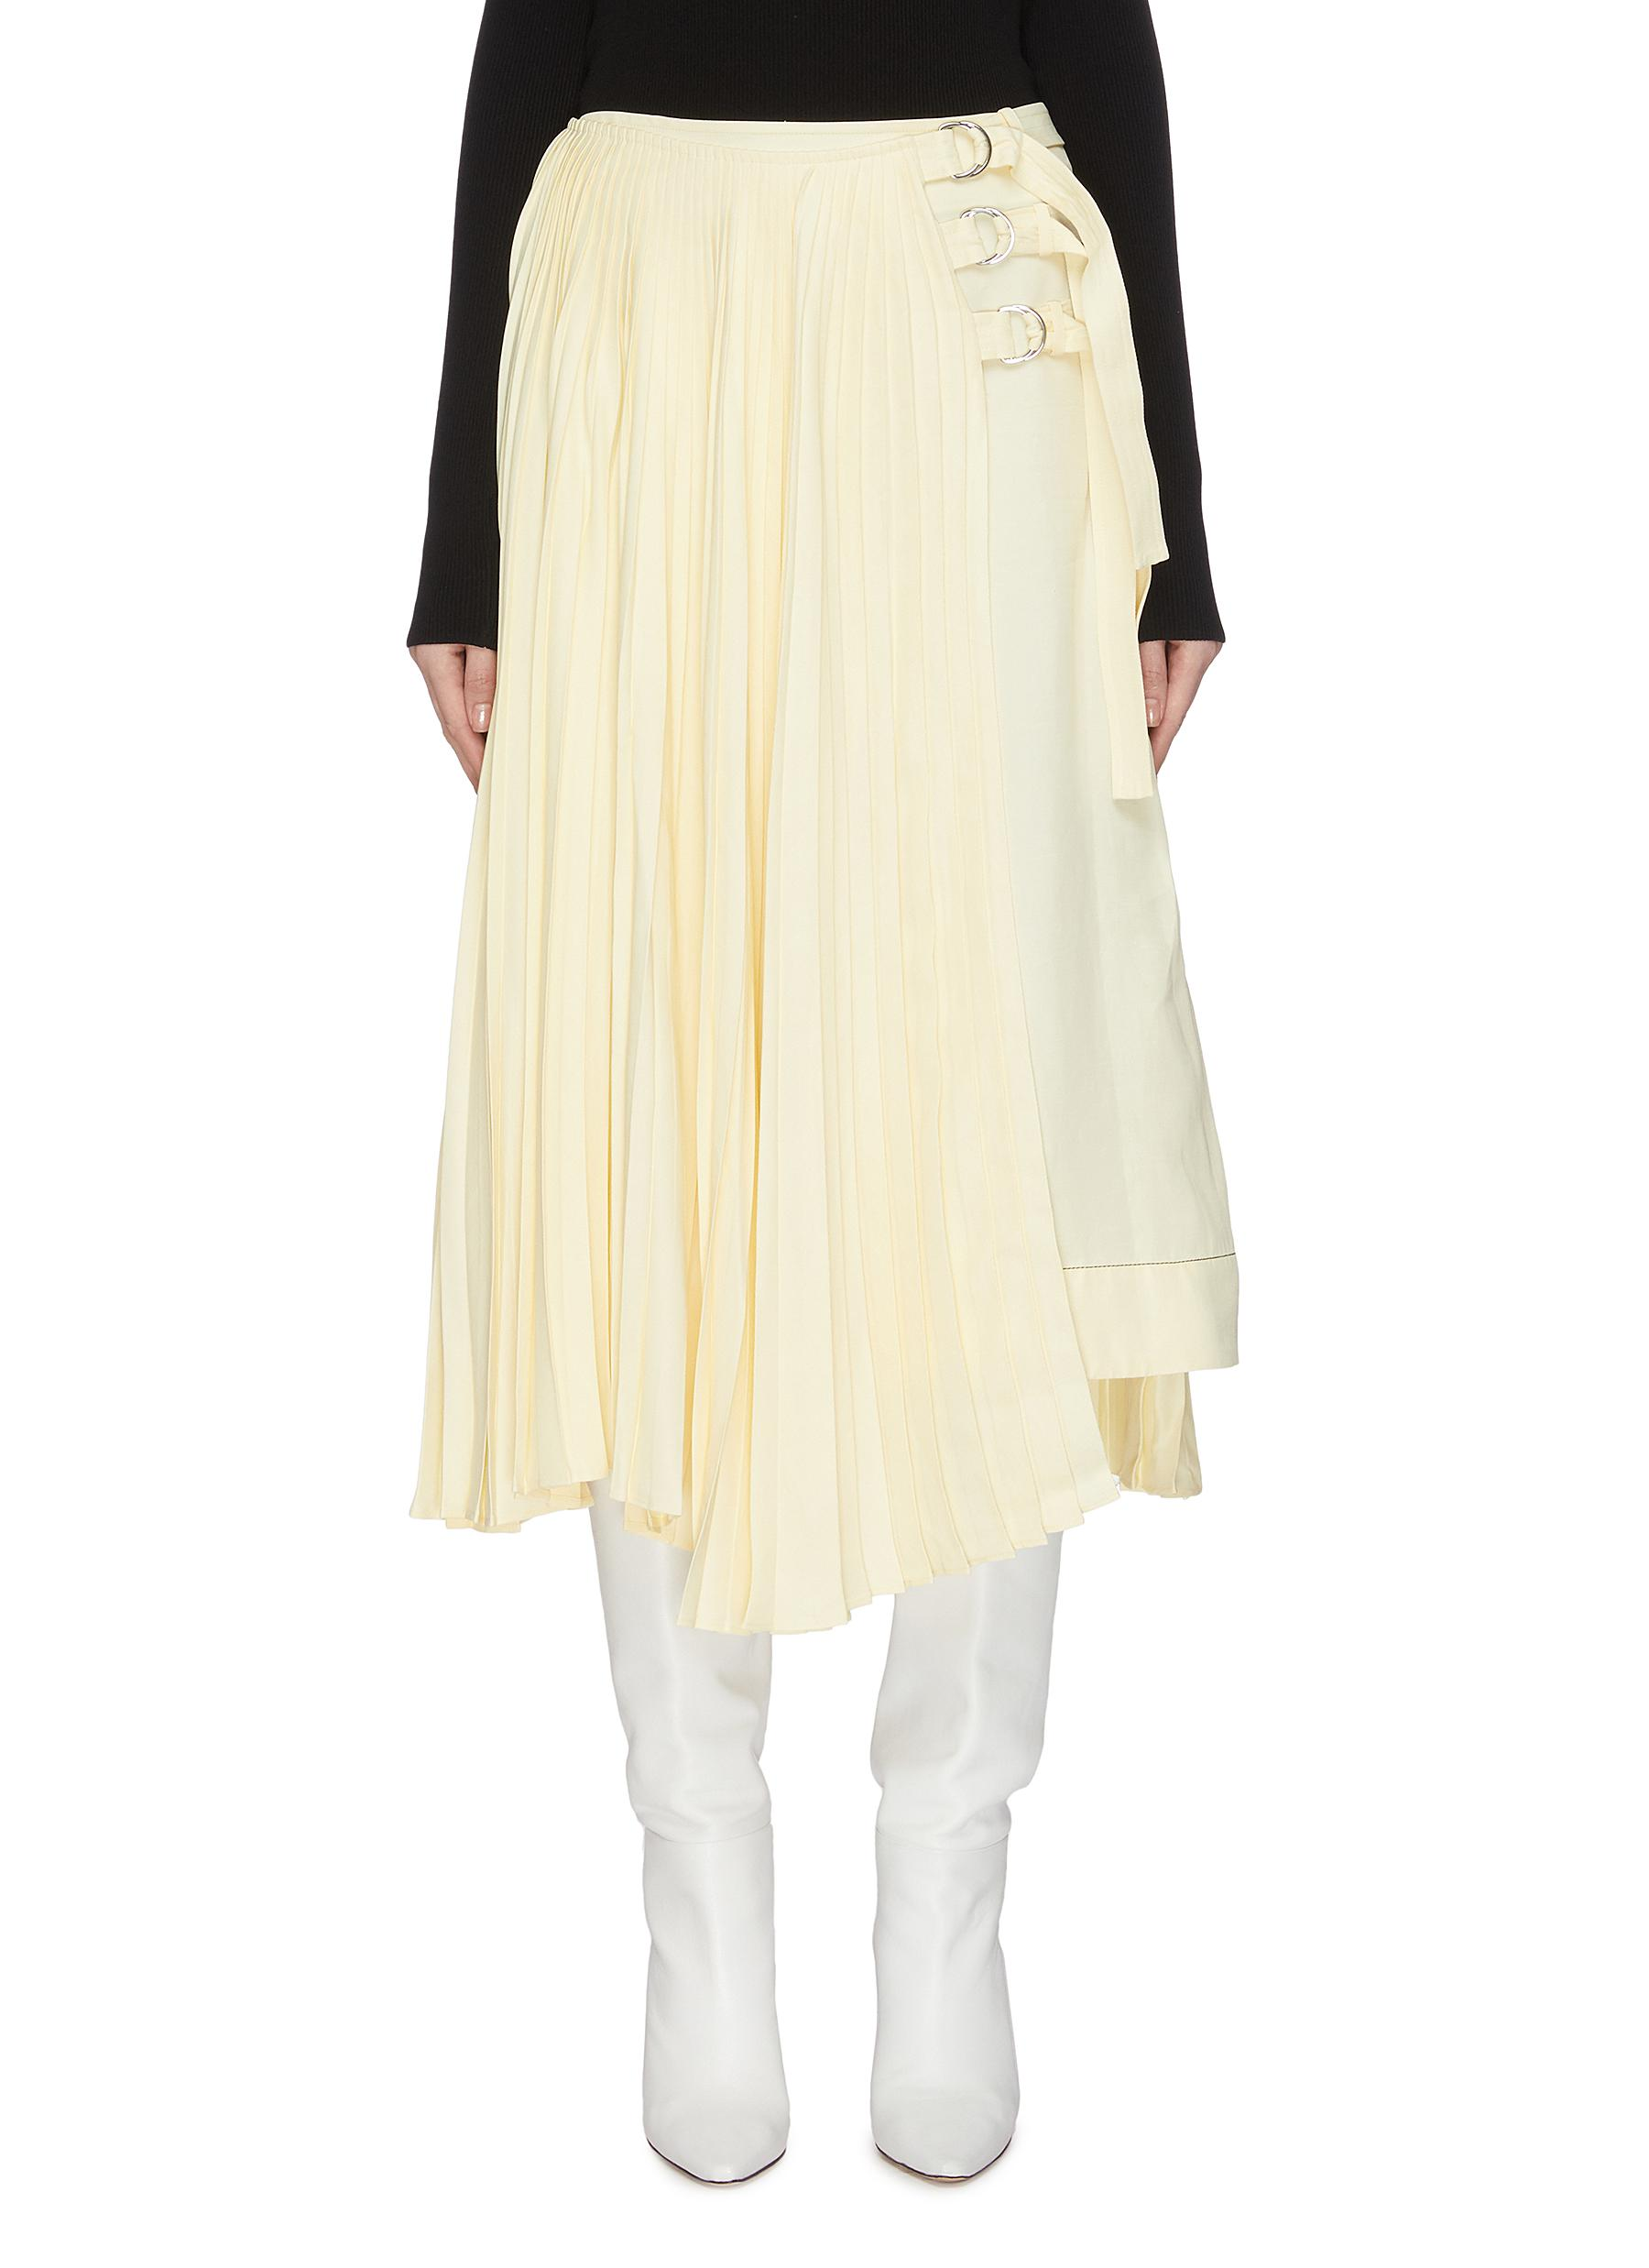 Buy Proenza Schouler Skirts Pleated buckle midi skirt